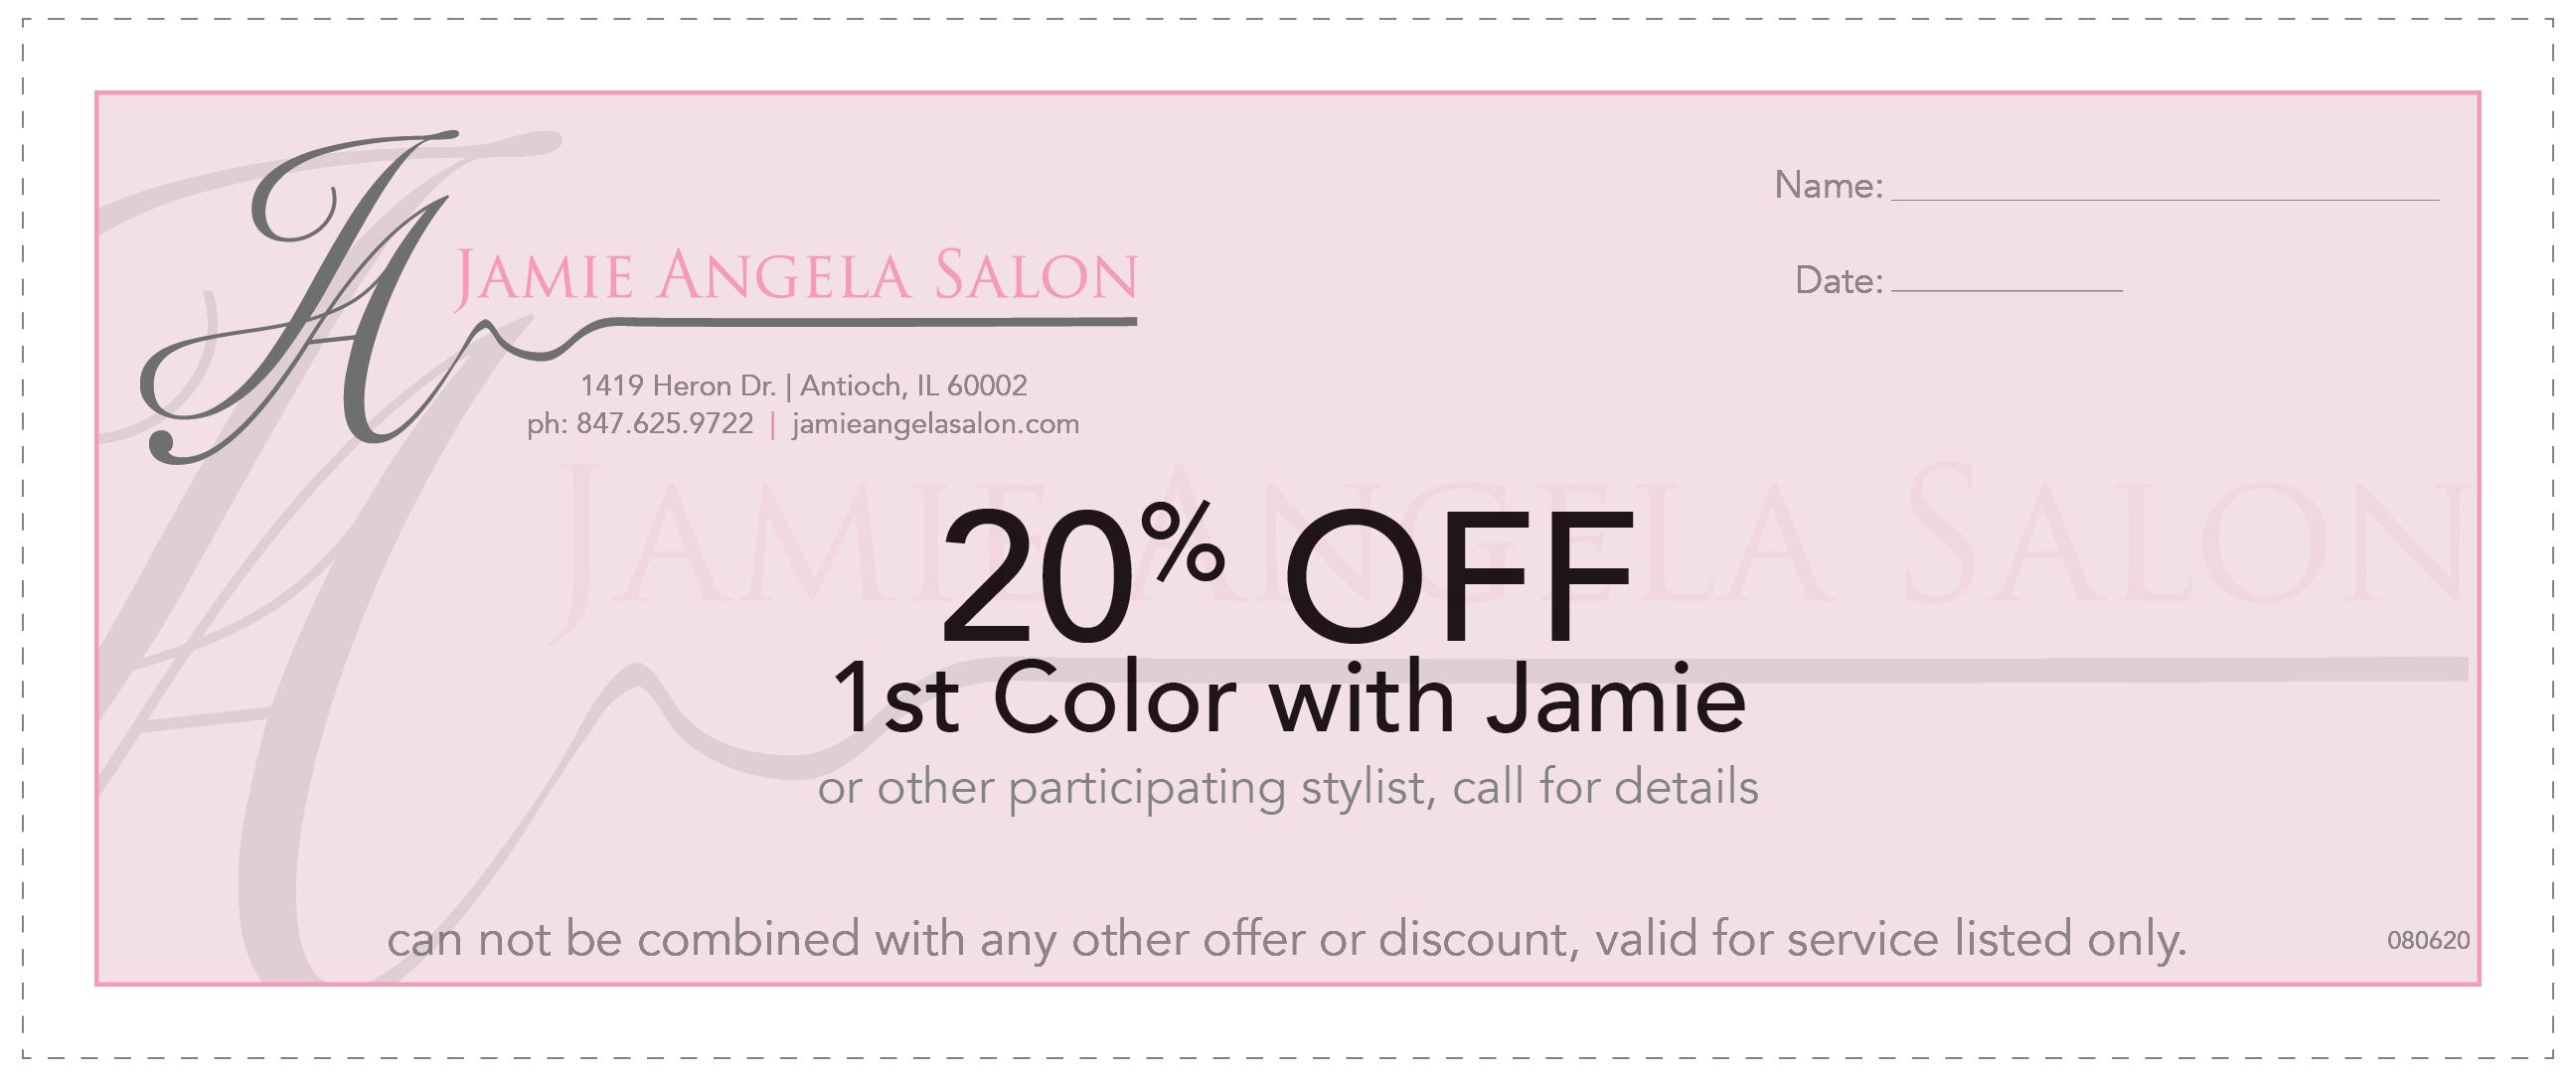 jamie-angela-salon-nail-coupon